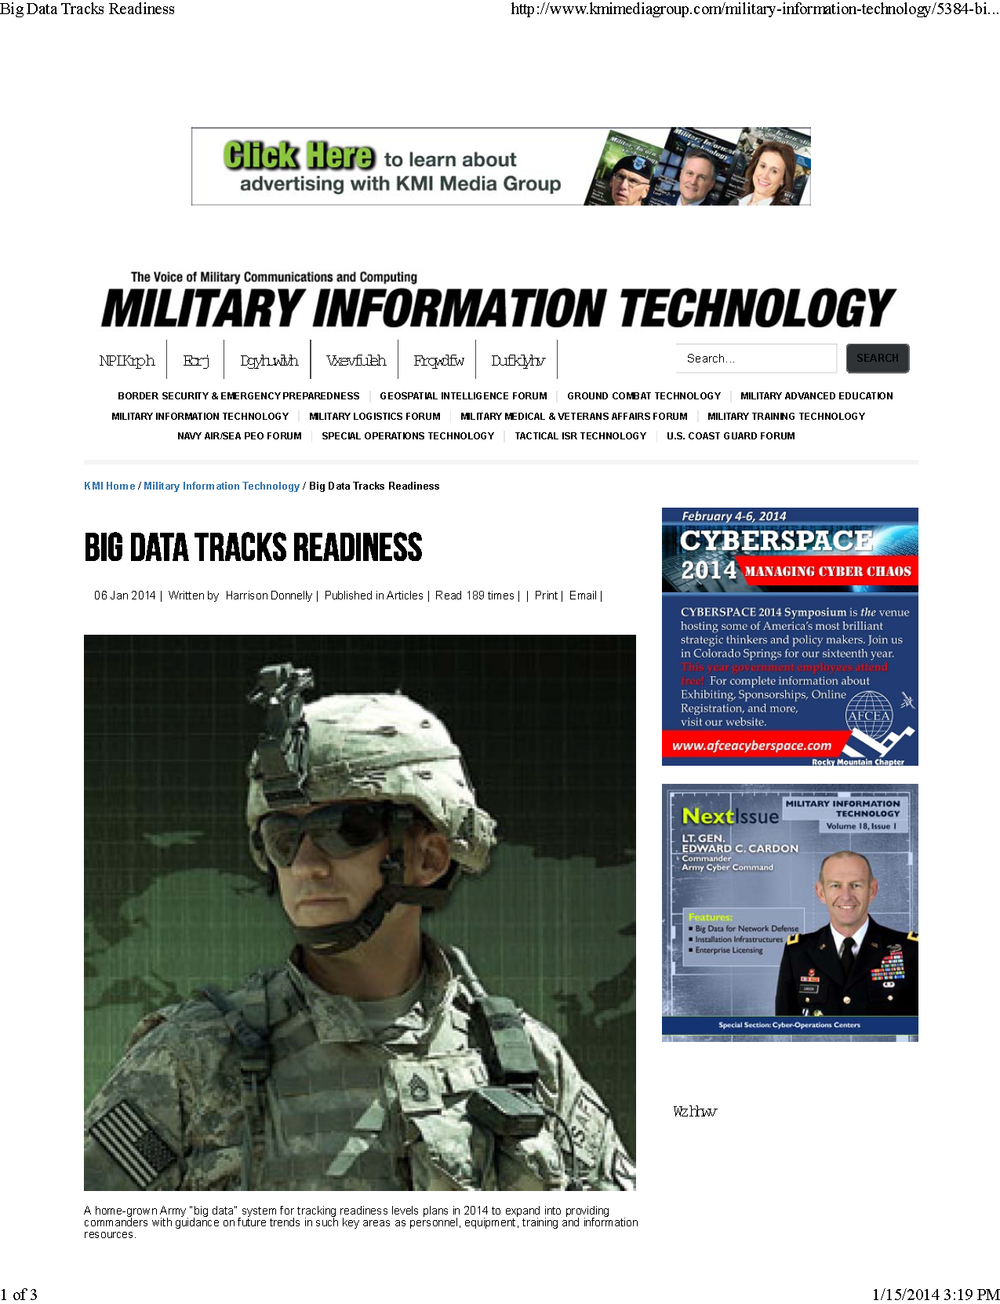 Big Data Tracks Readiness_MIT_Jan 2014_Page_1.png